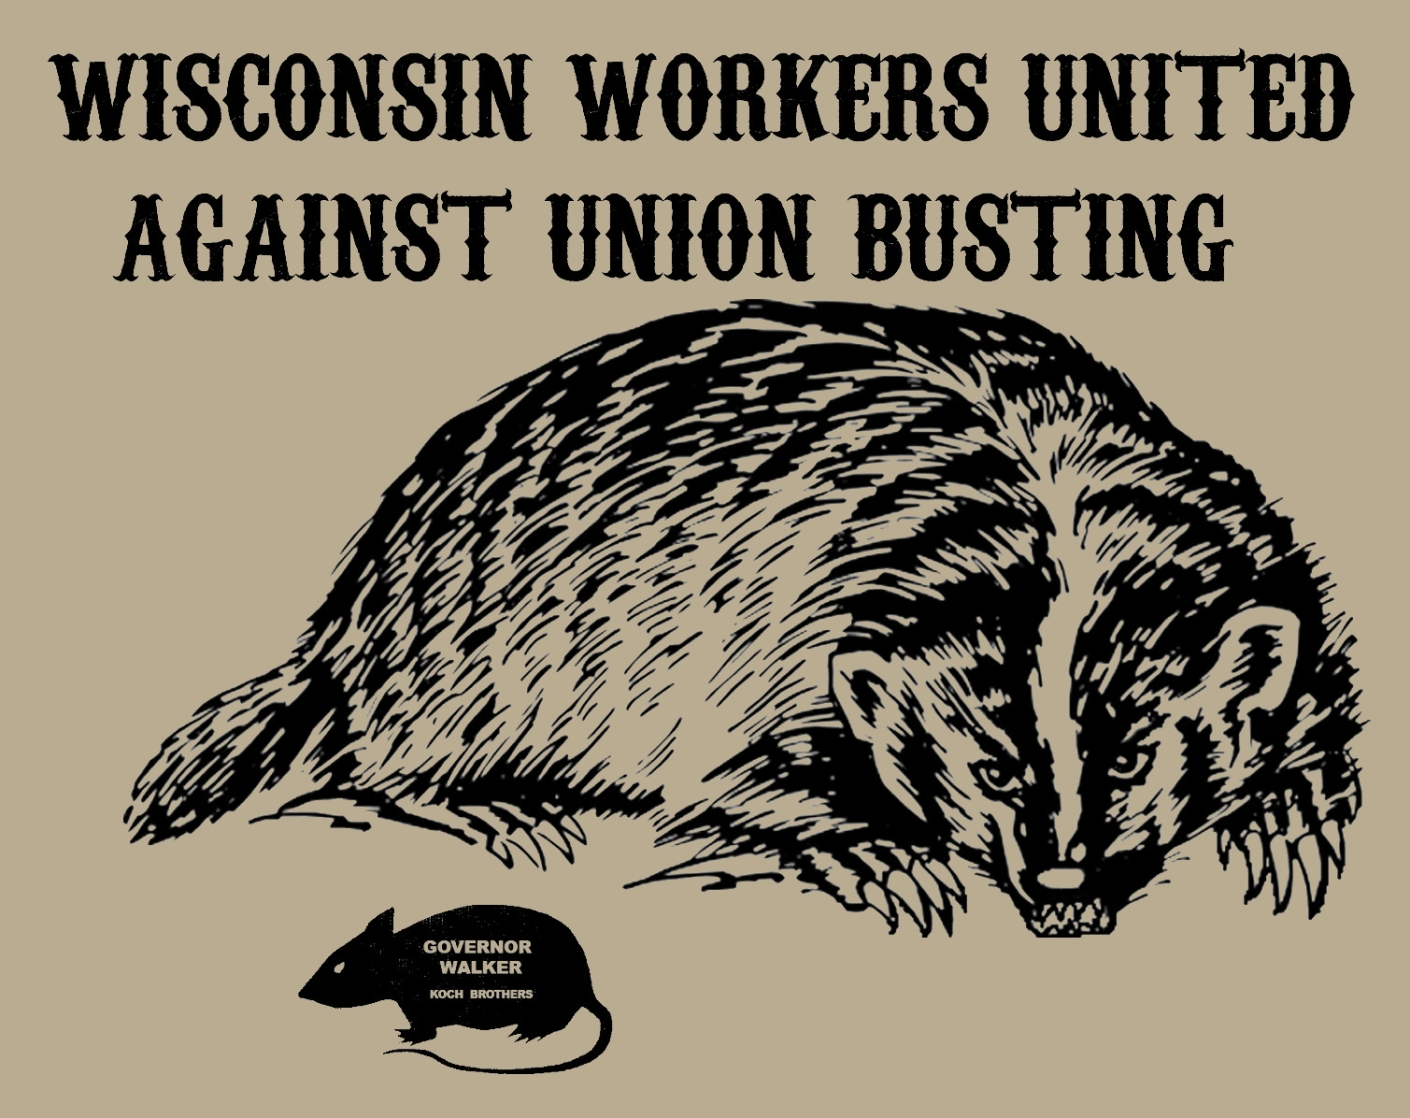 lampert_WisconsinWorkersUnited-